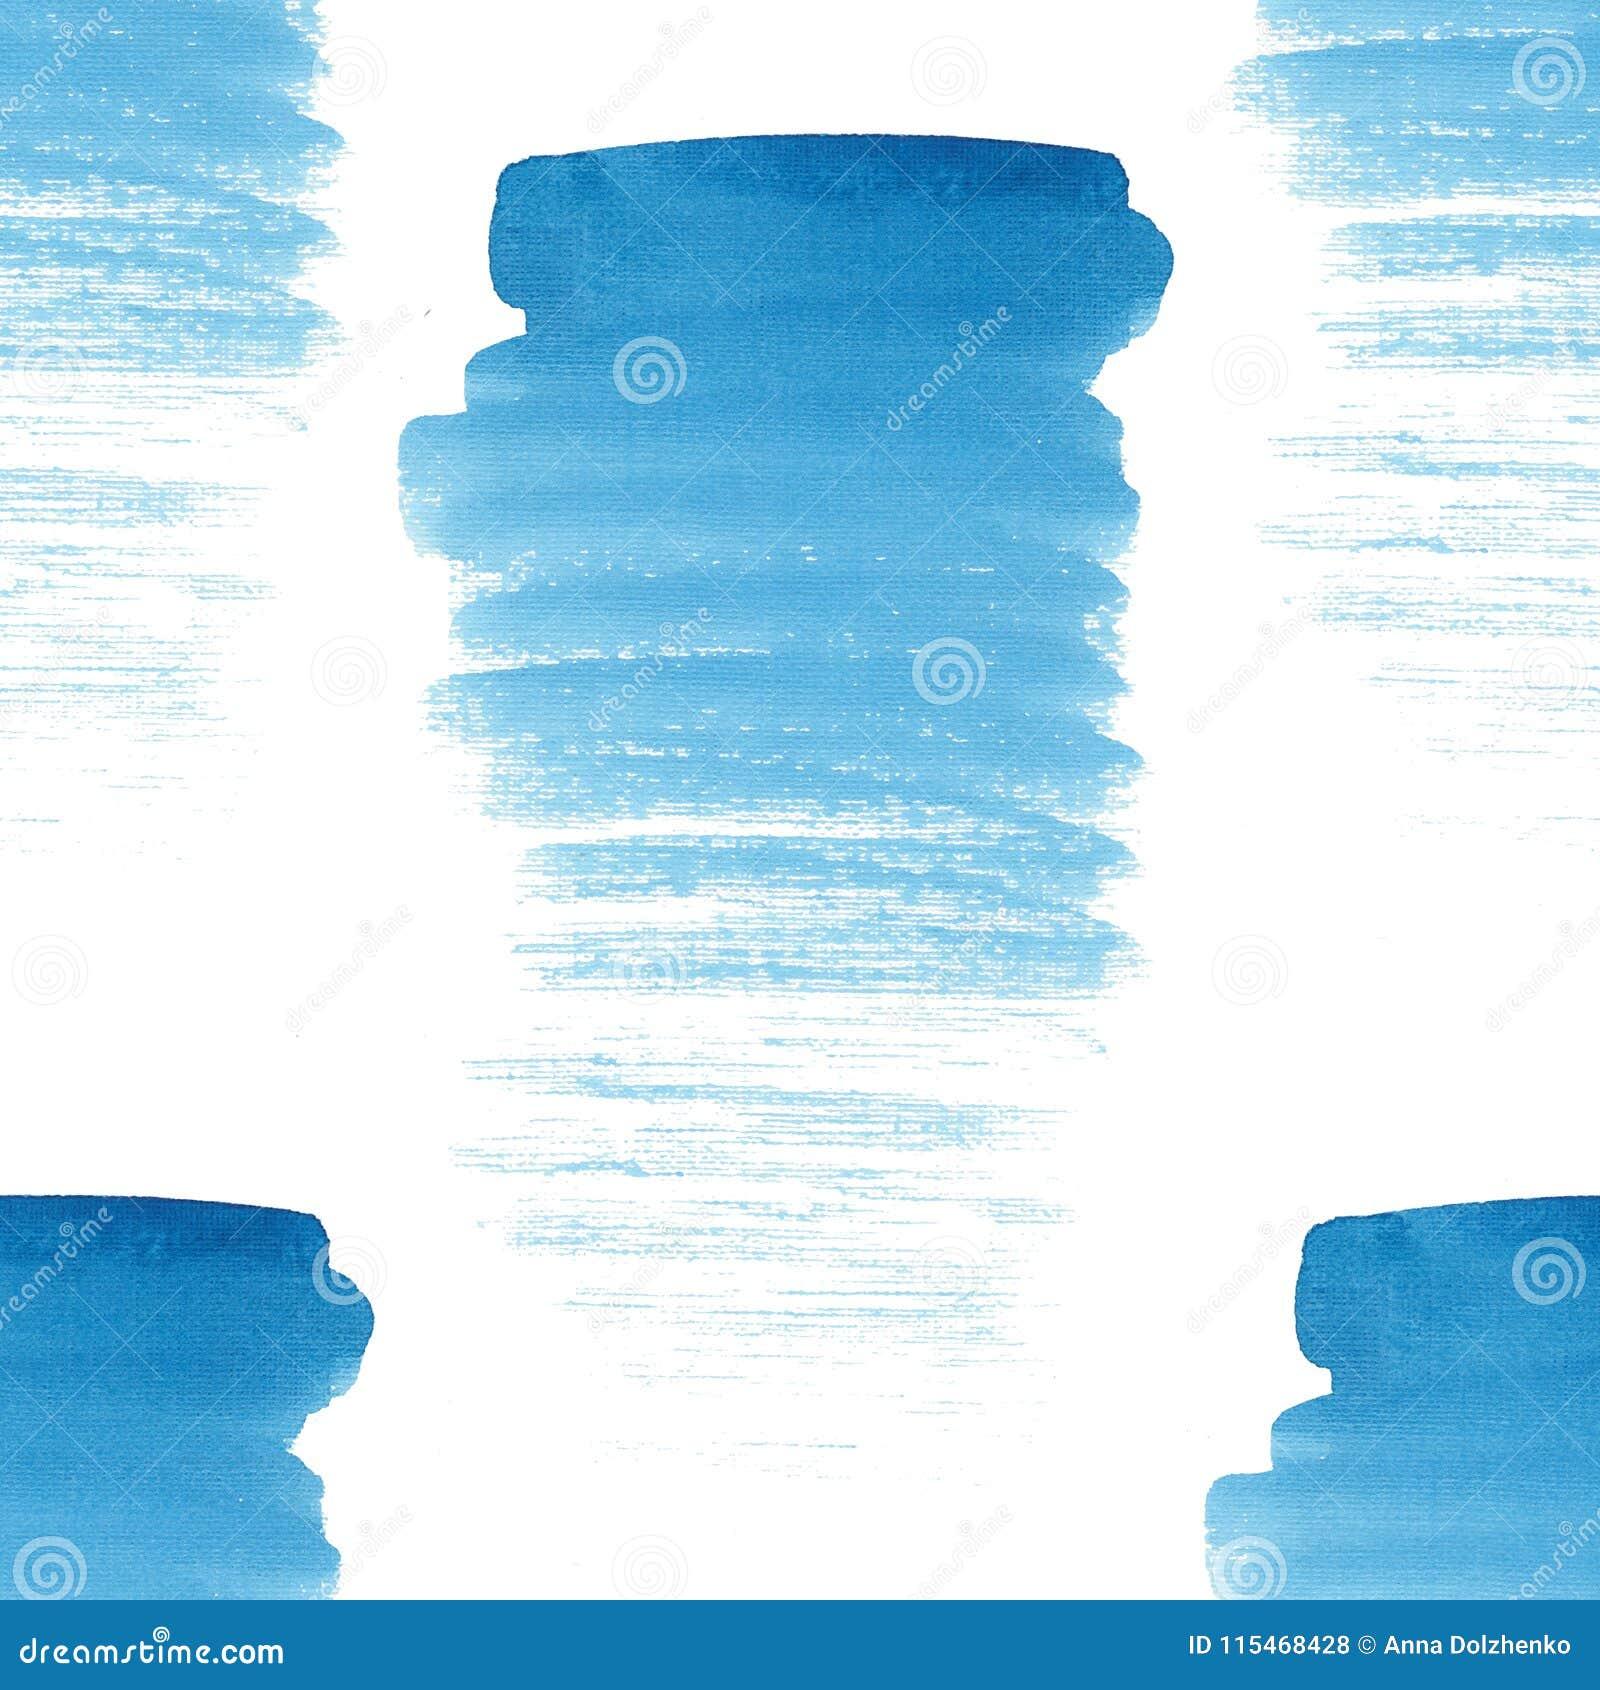 Abstract beautiful artistic tender wonderful transparent bright summer blue spots pattern watercolor hand illustration